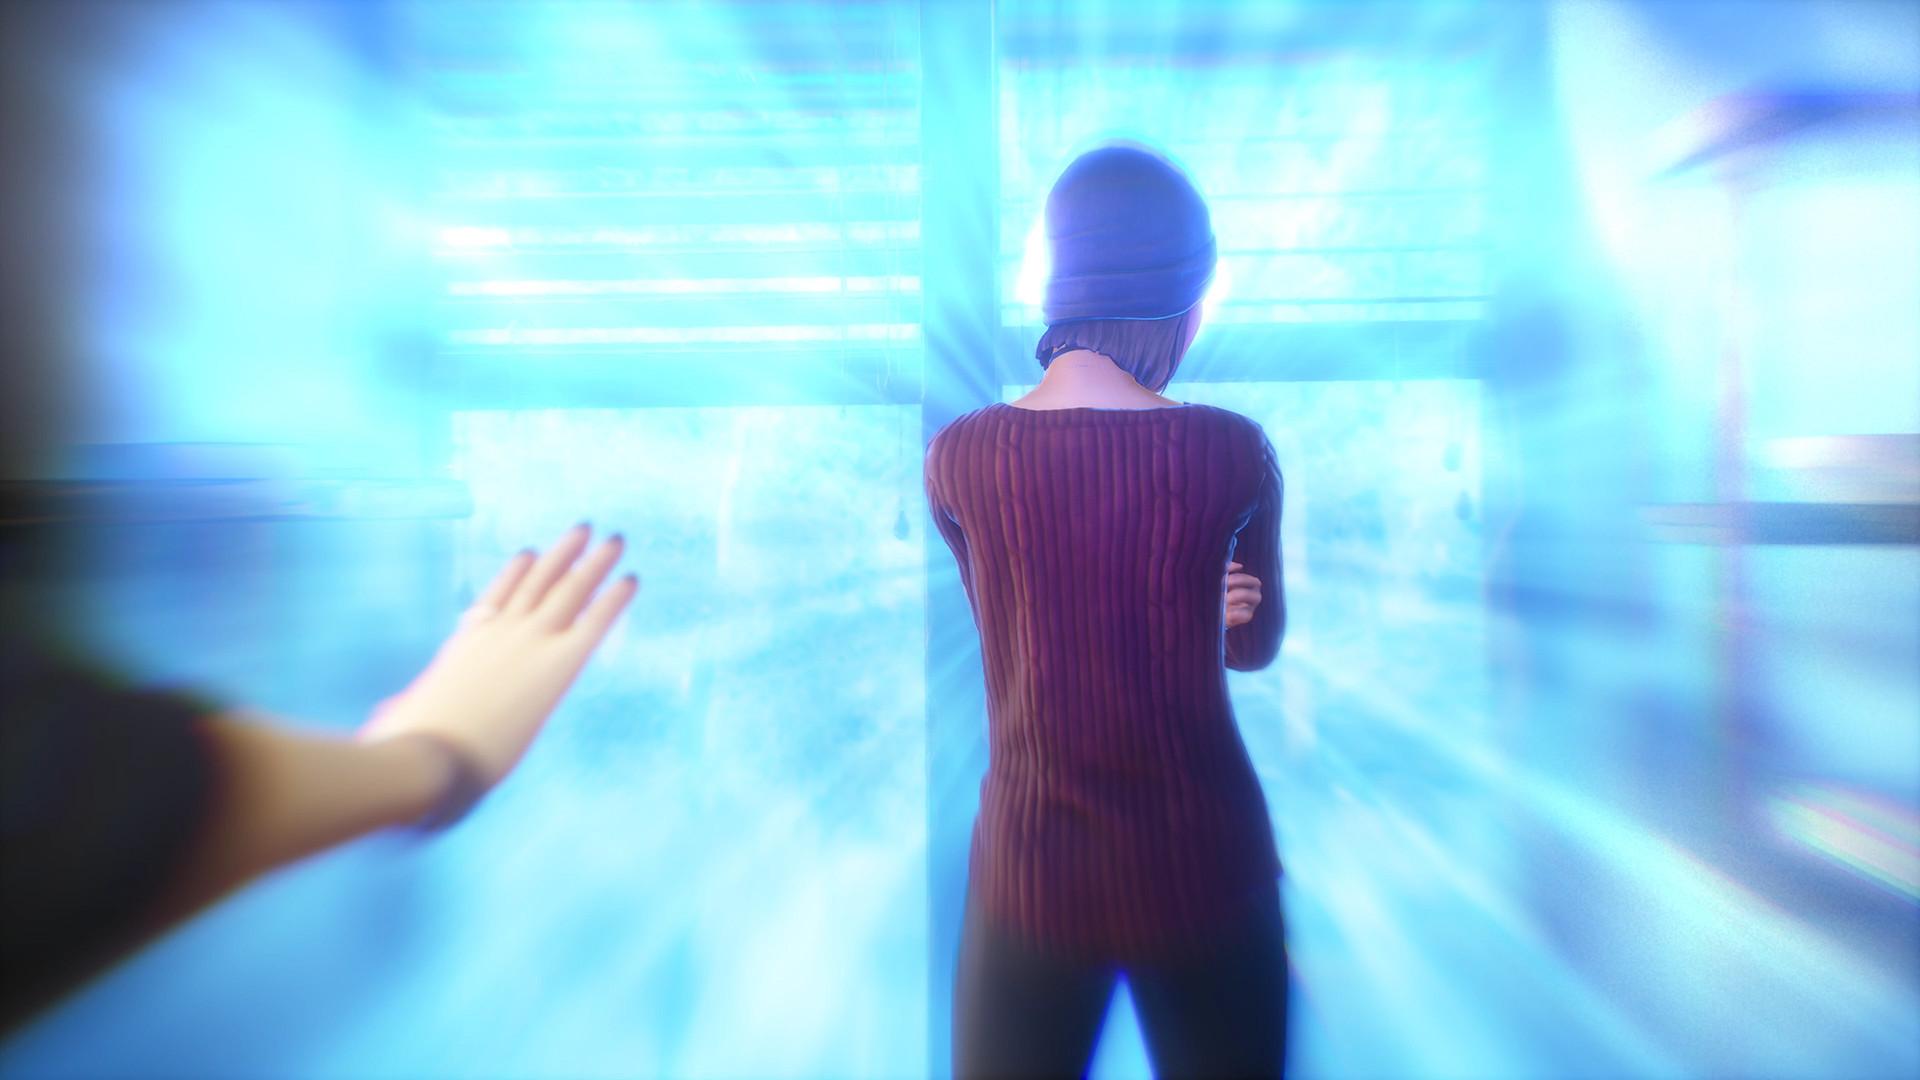 На канале Life is Strange вышло Lo-Fi видео с игровый саундтреком